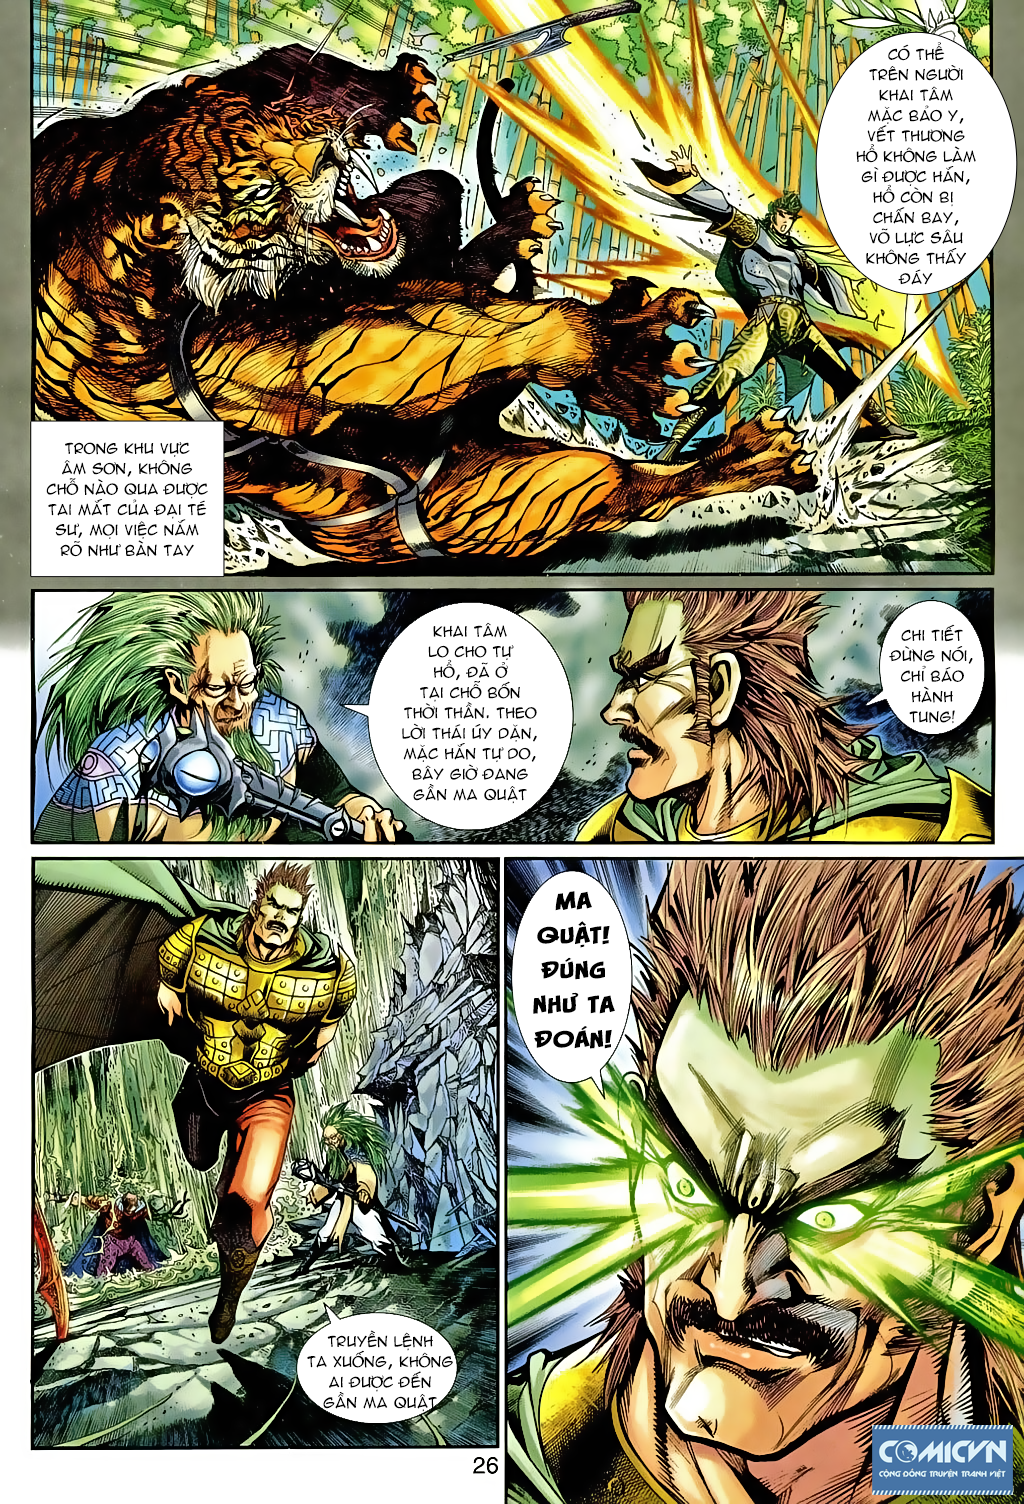 Thần binh huyền kỳ 3 - 3.5 Chapter 80 - Hamtruyen.vn